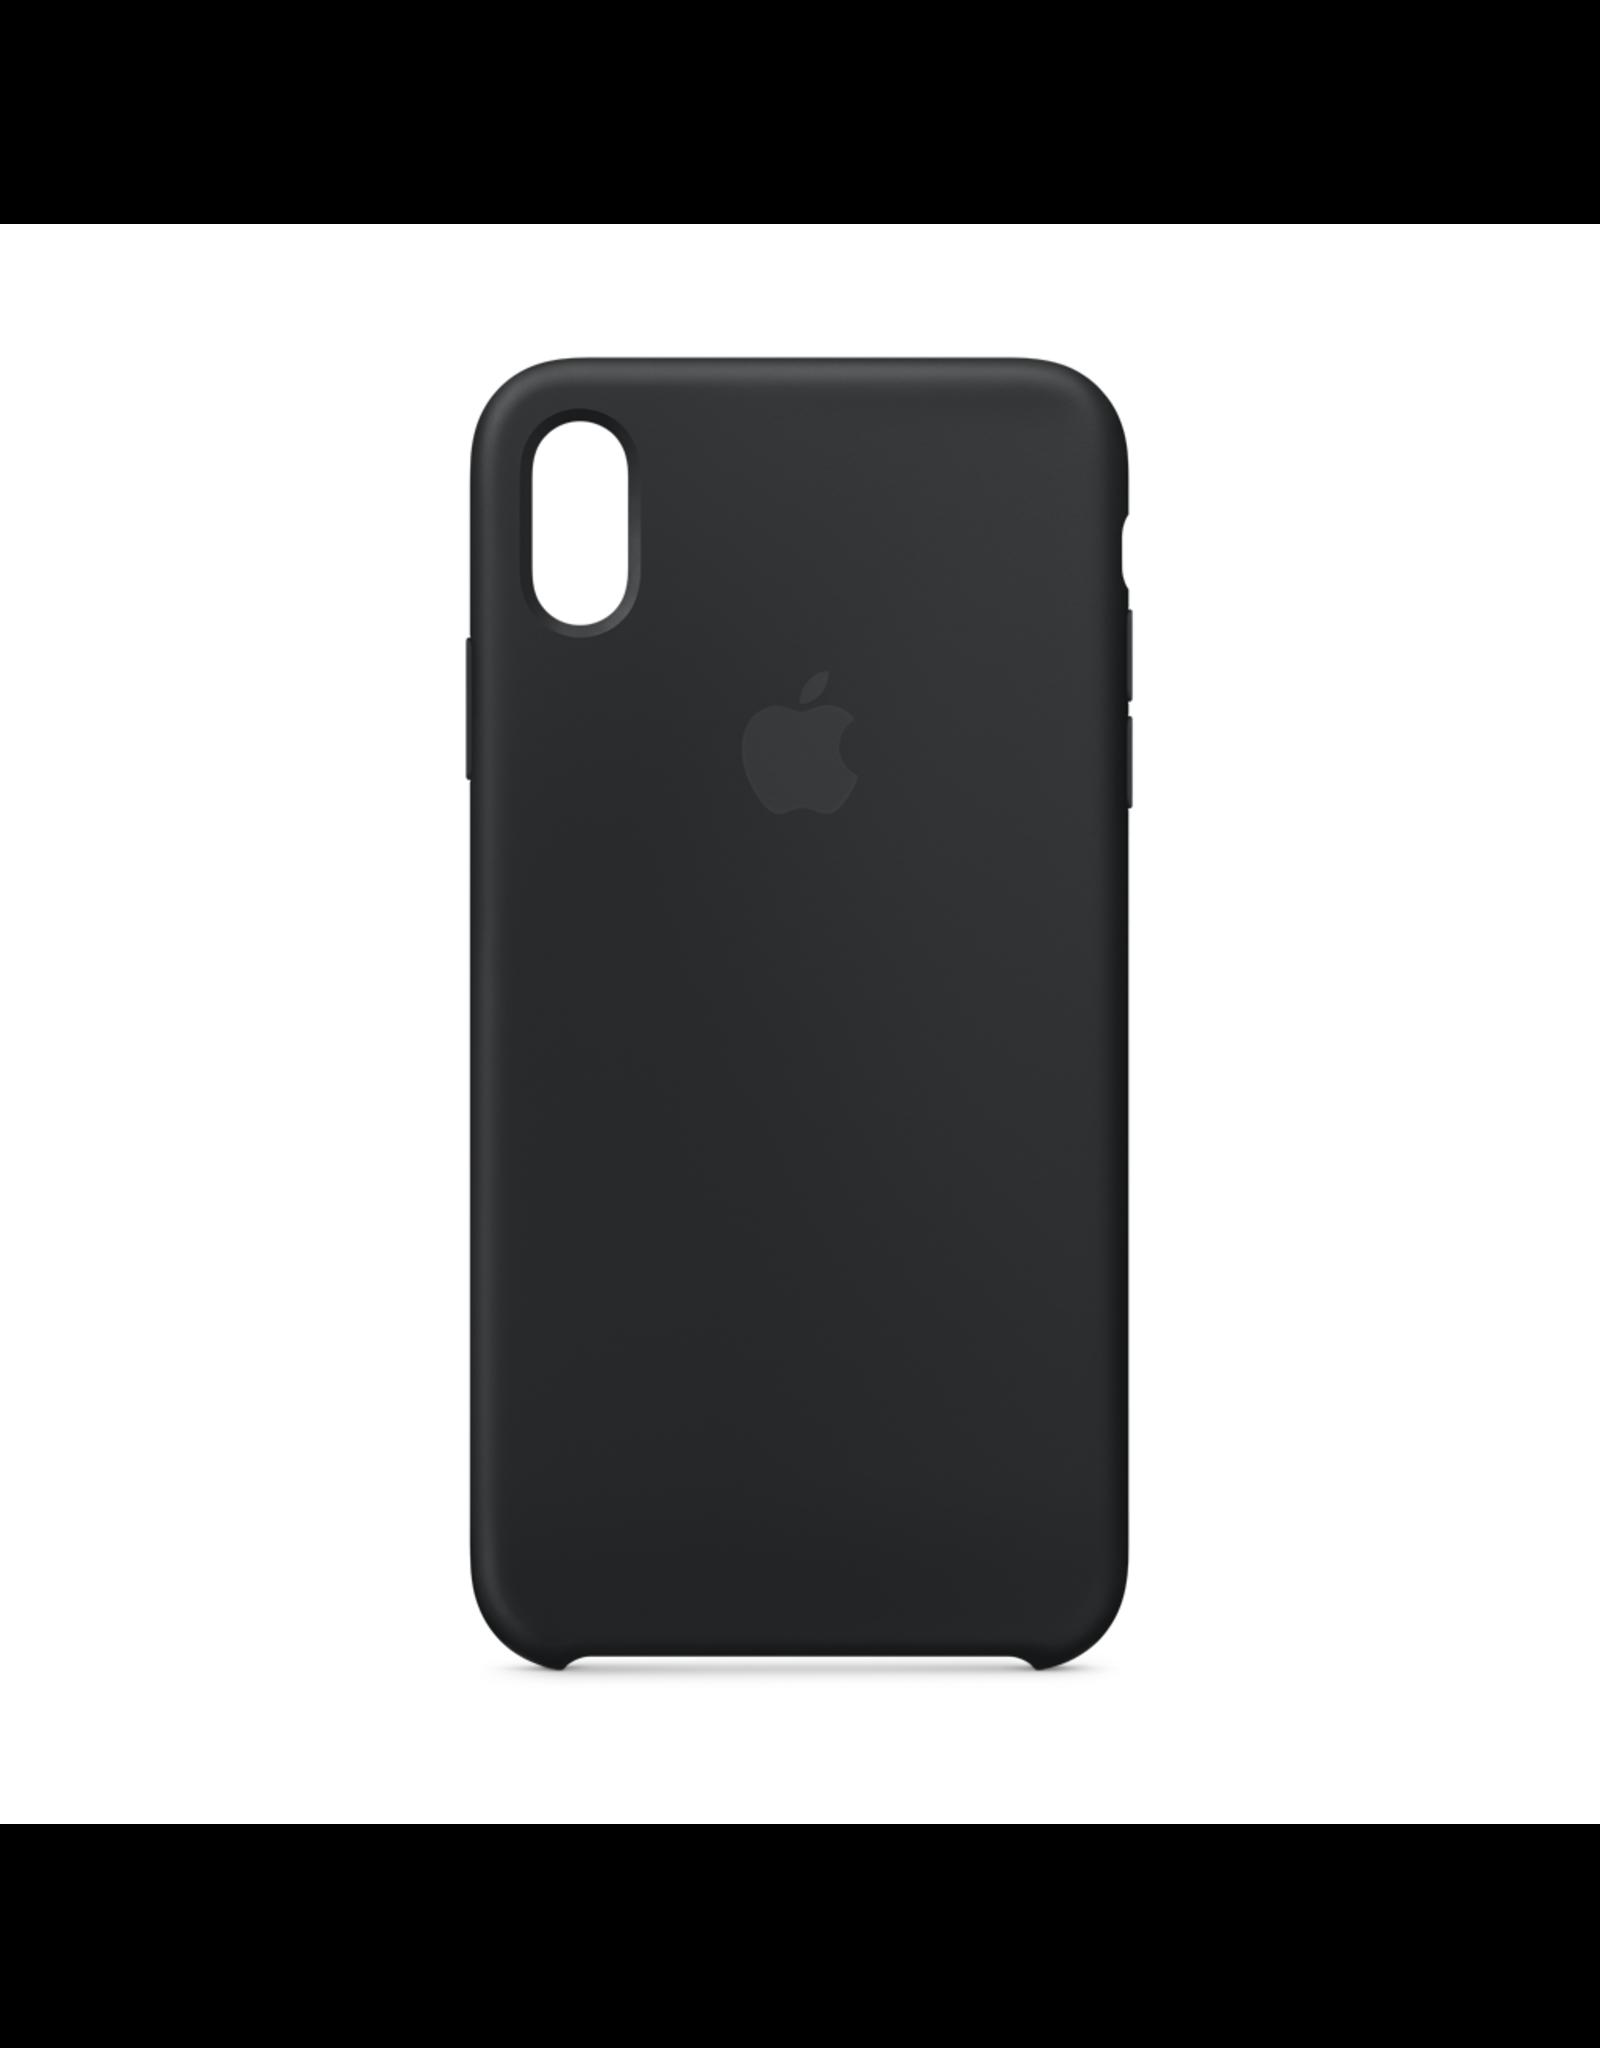 Apple Apple iPhone XS Max Silicone Case Black